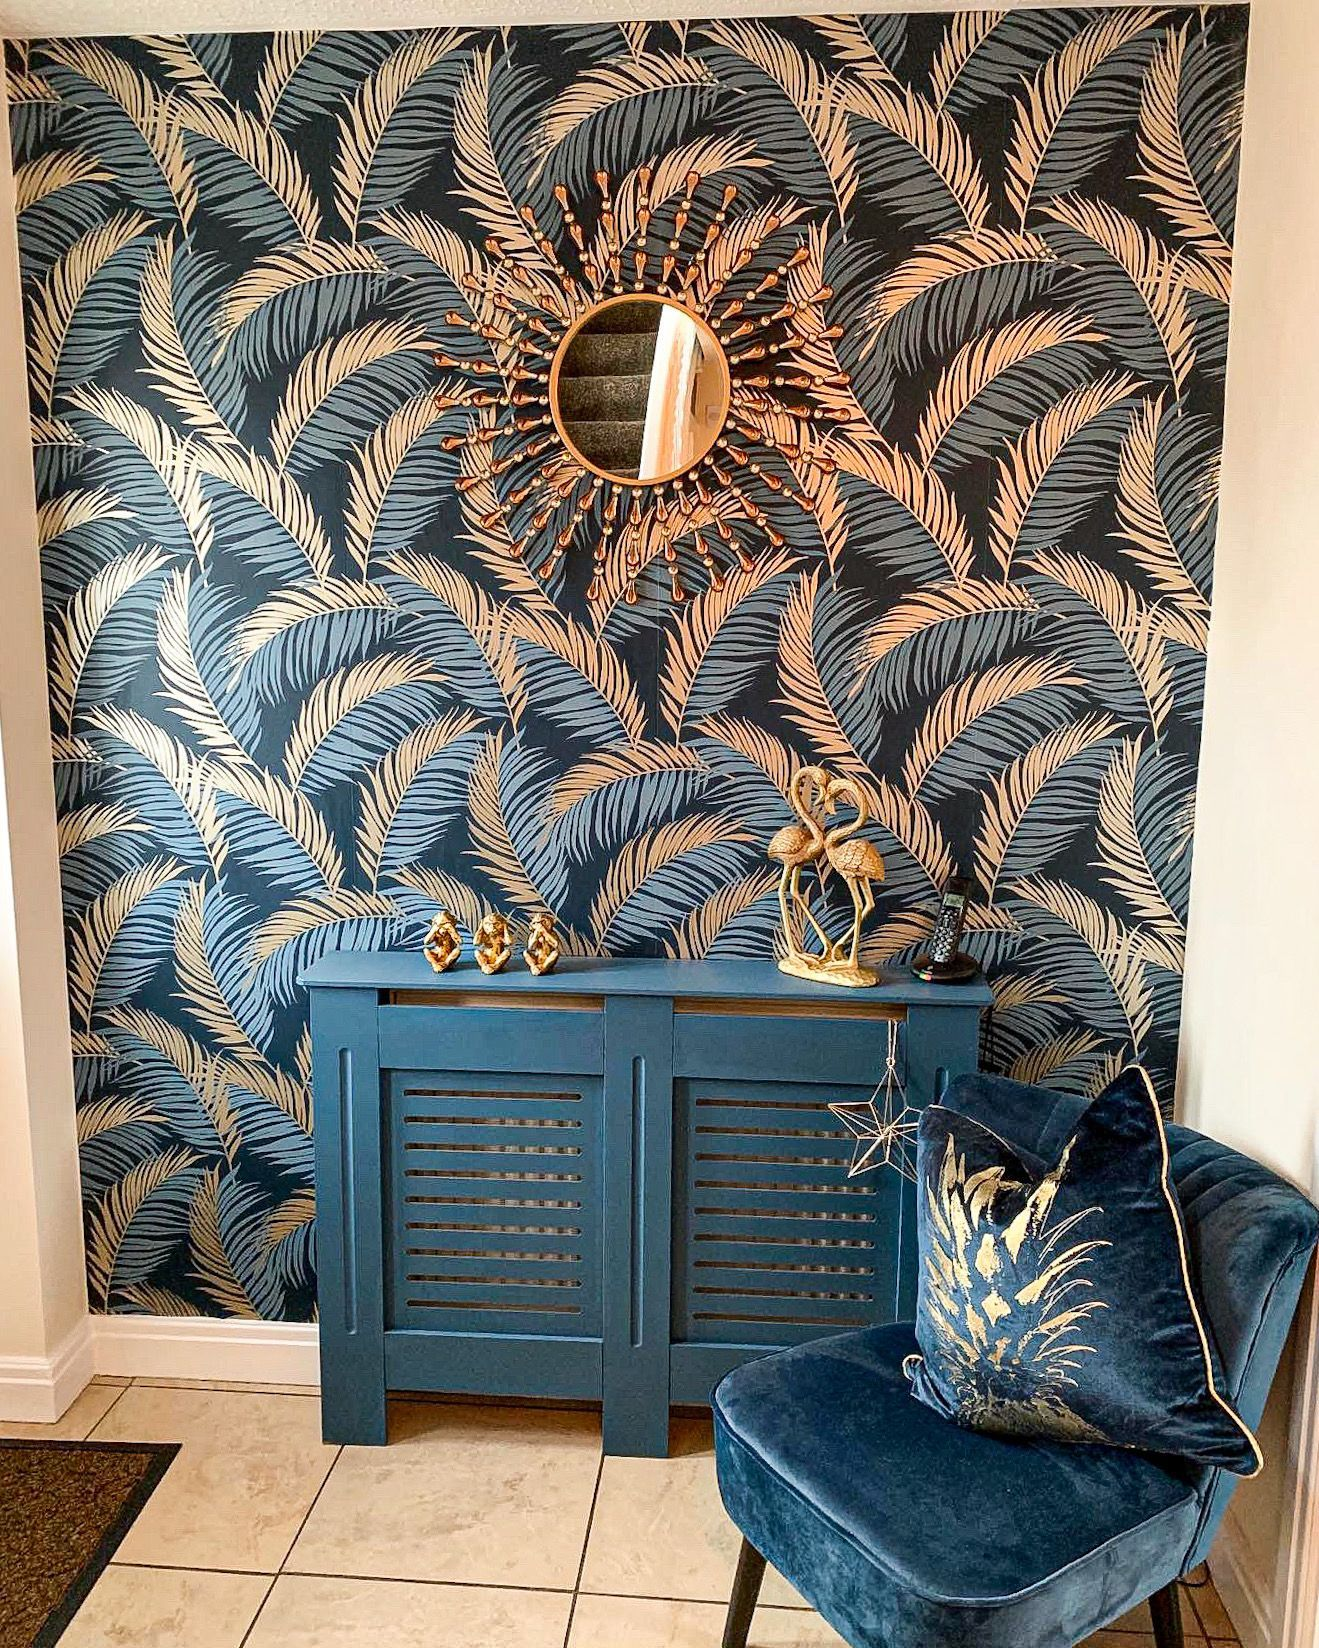 Vivienne Leaf Wallpaper Navy, Gold in 2020 Love